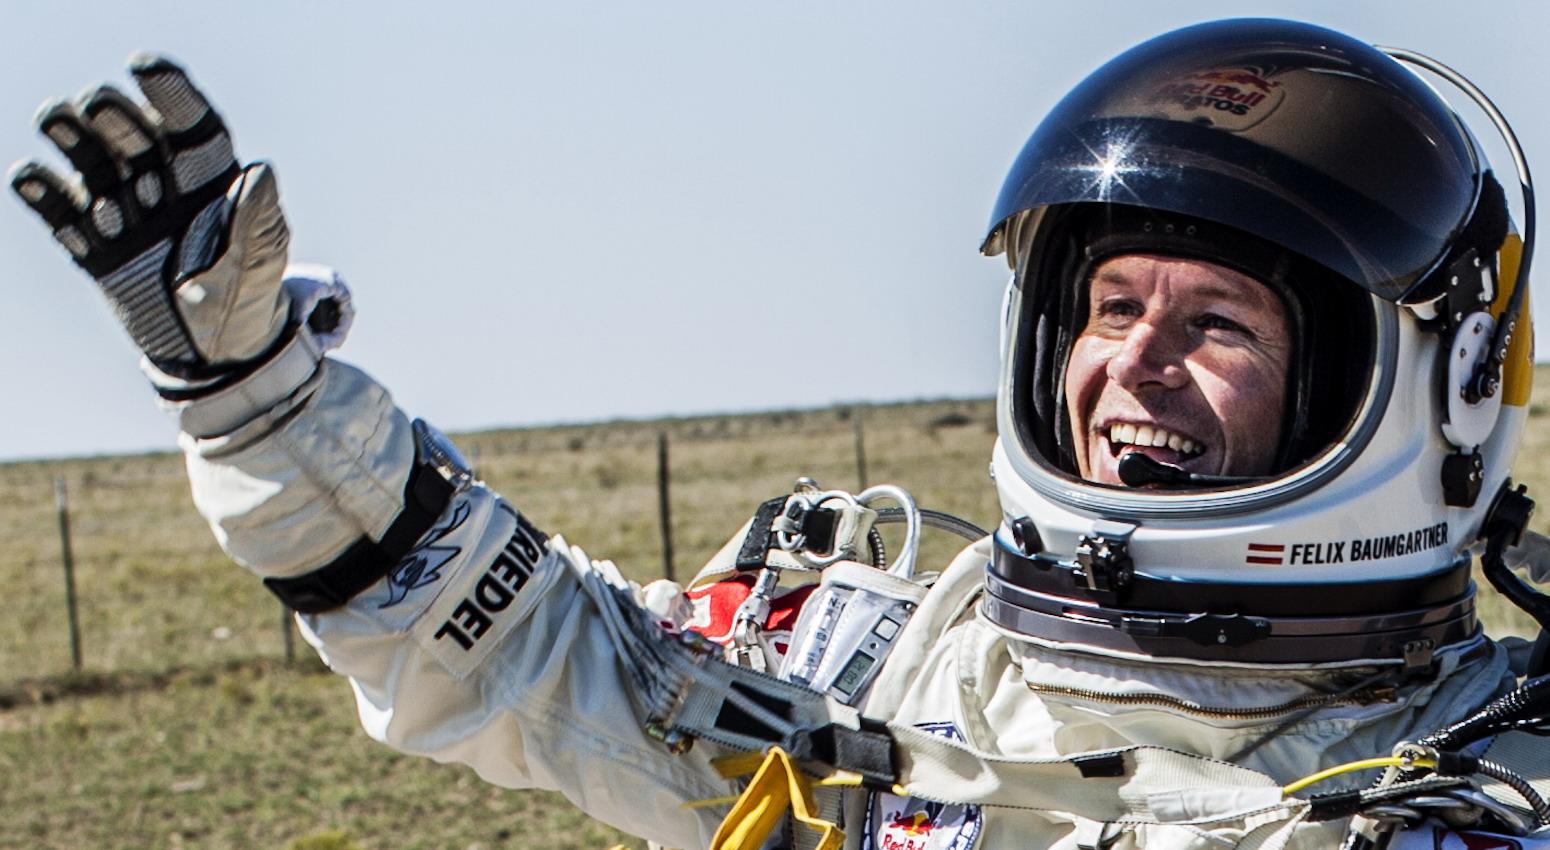 Felix Baumgartner Landing